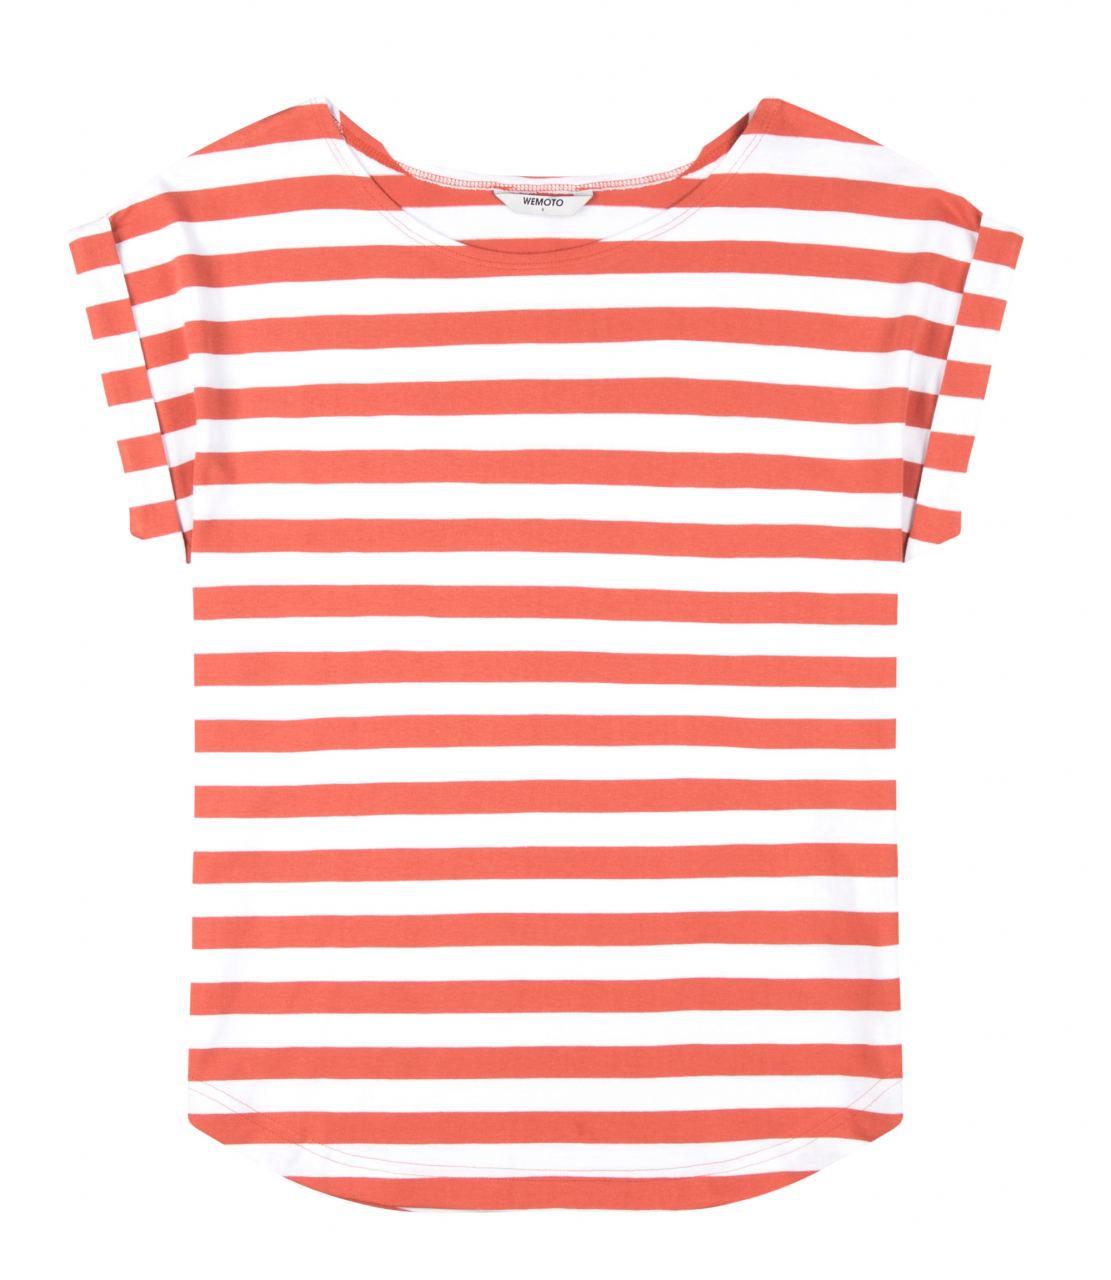 Bell Striped Shirt Emberglow White